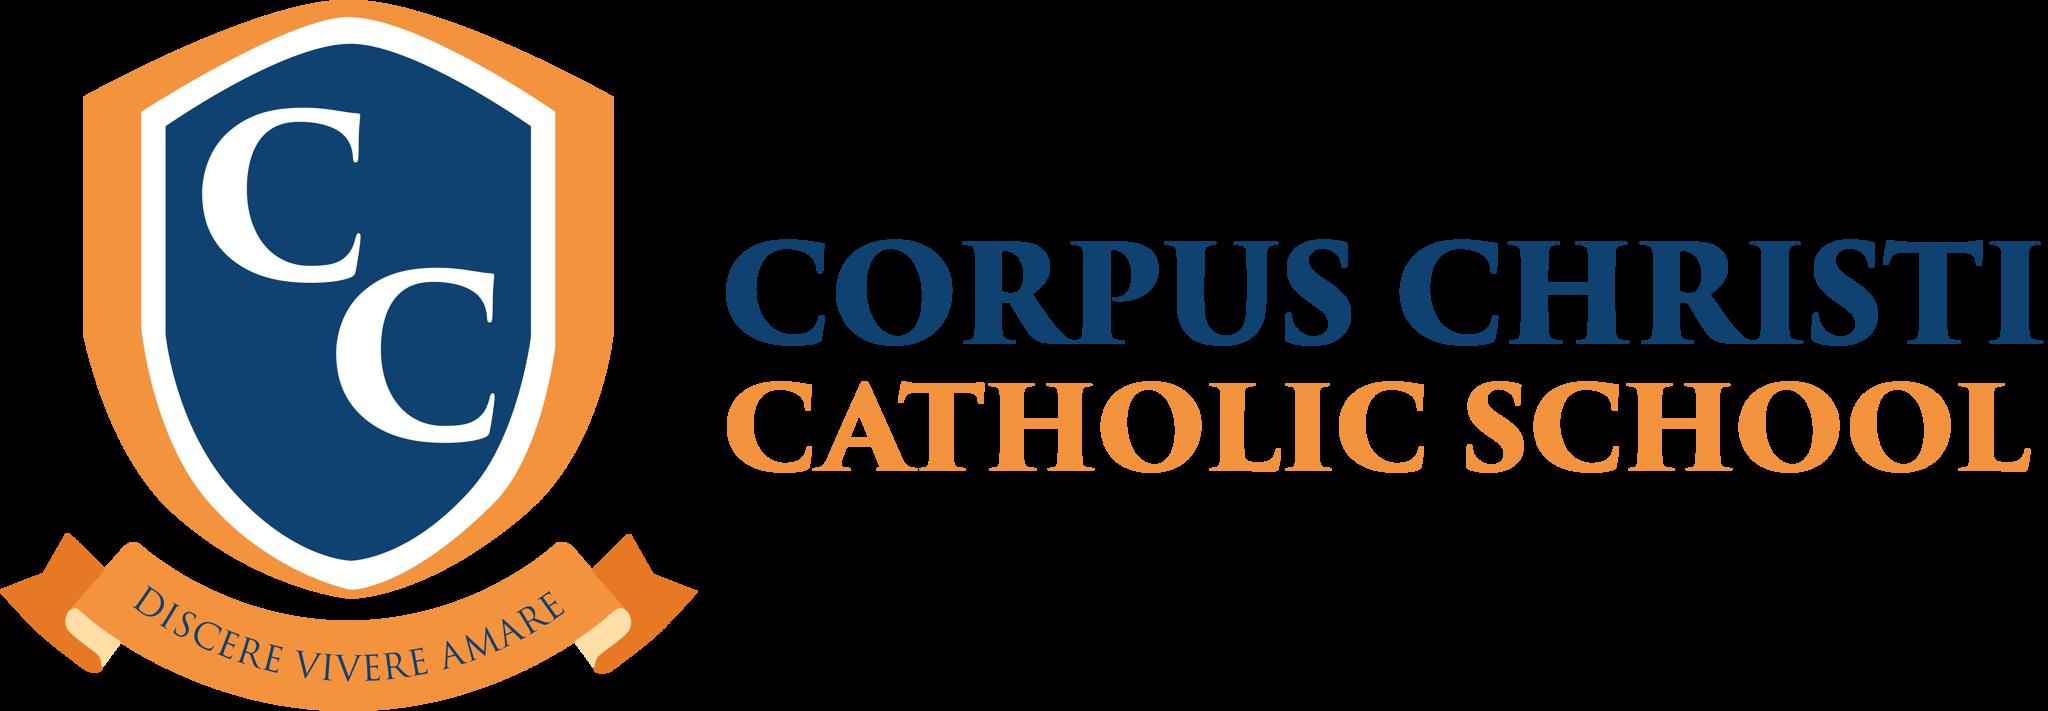 Music Lessons | Corpus Christi Catholic School